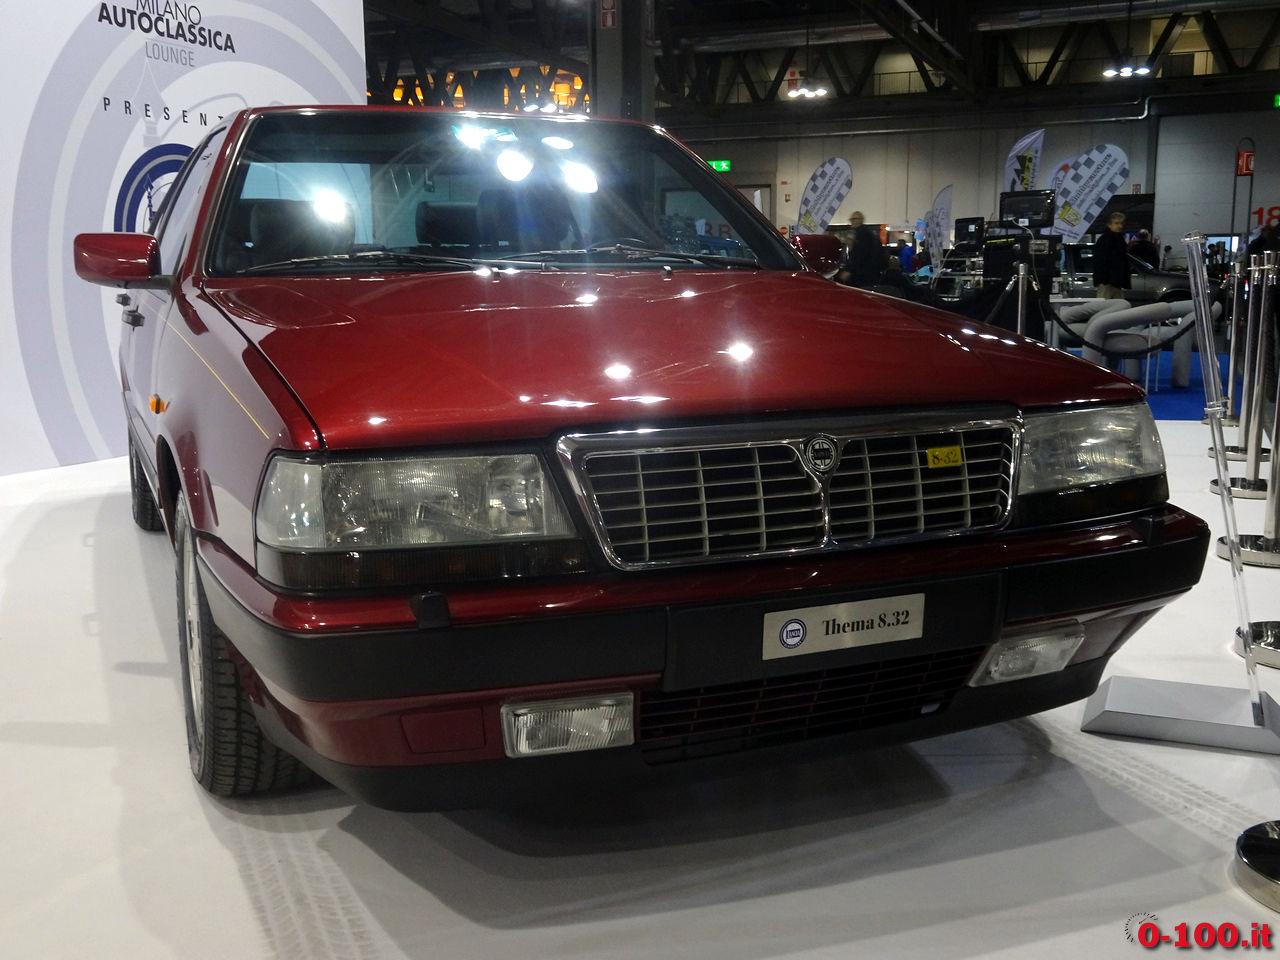 duemila-ruote-milano-autoclassica-rm-sothebys-0-100-lancia-thema-8-32_48